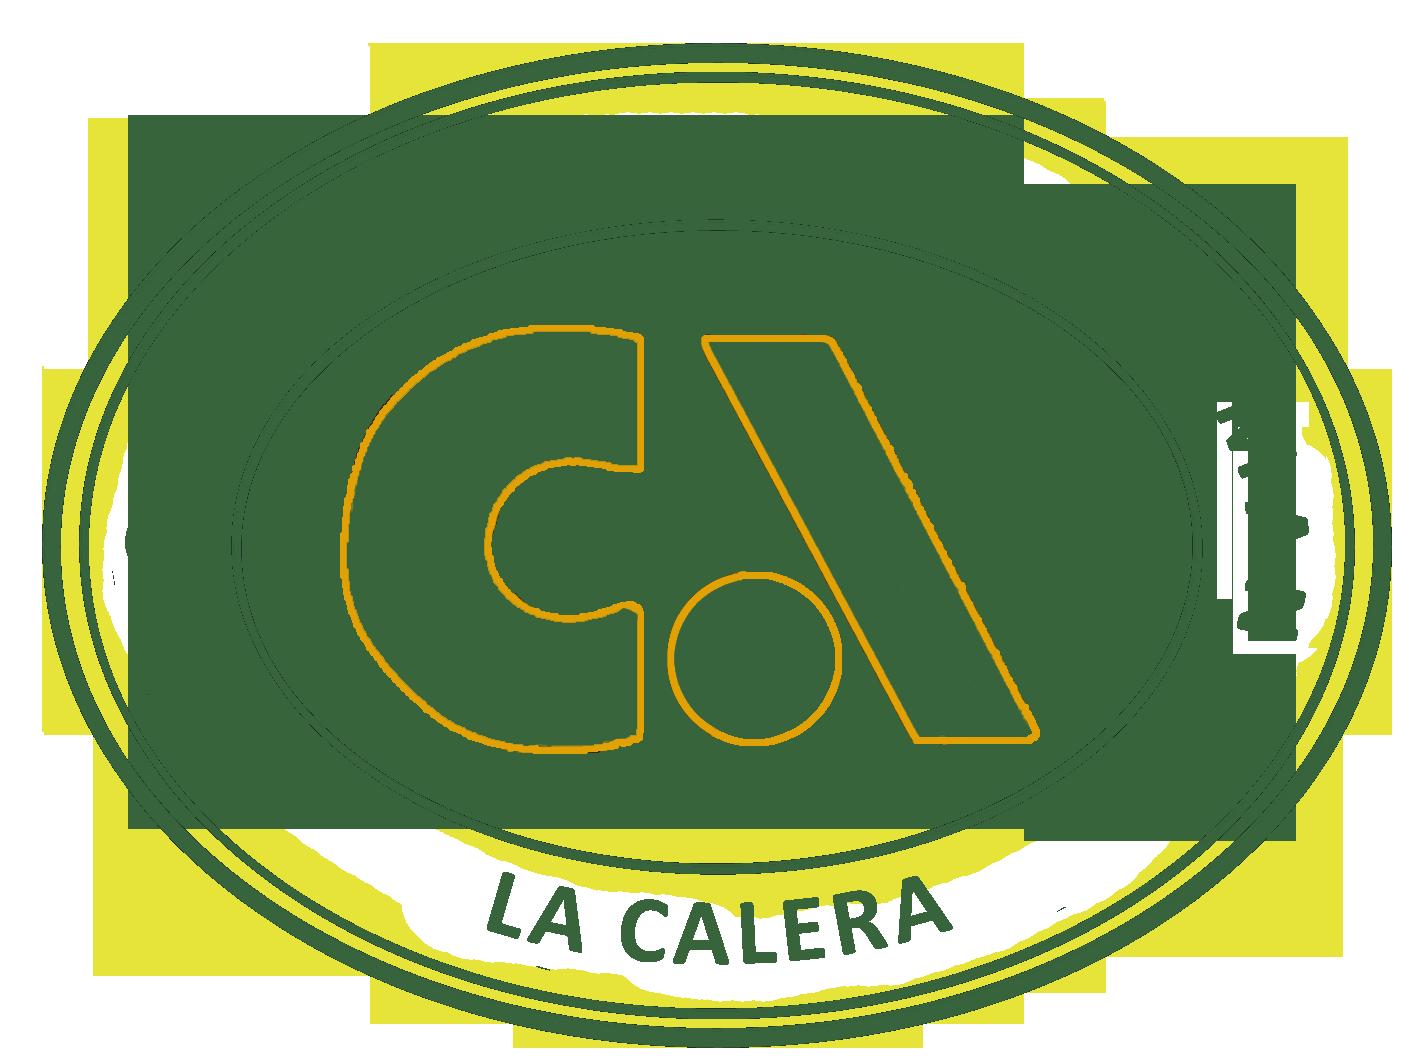 LOGO CORPORACIÓN EDUCACIONAL APUMANQUE 2019